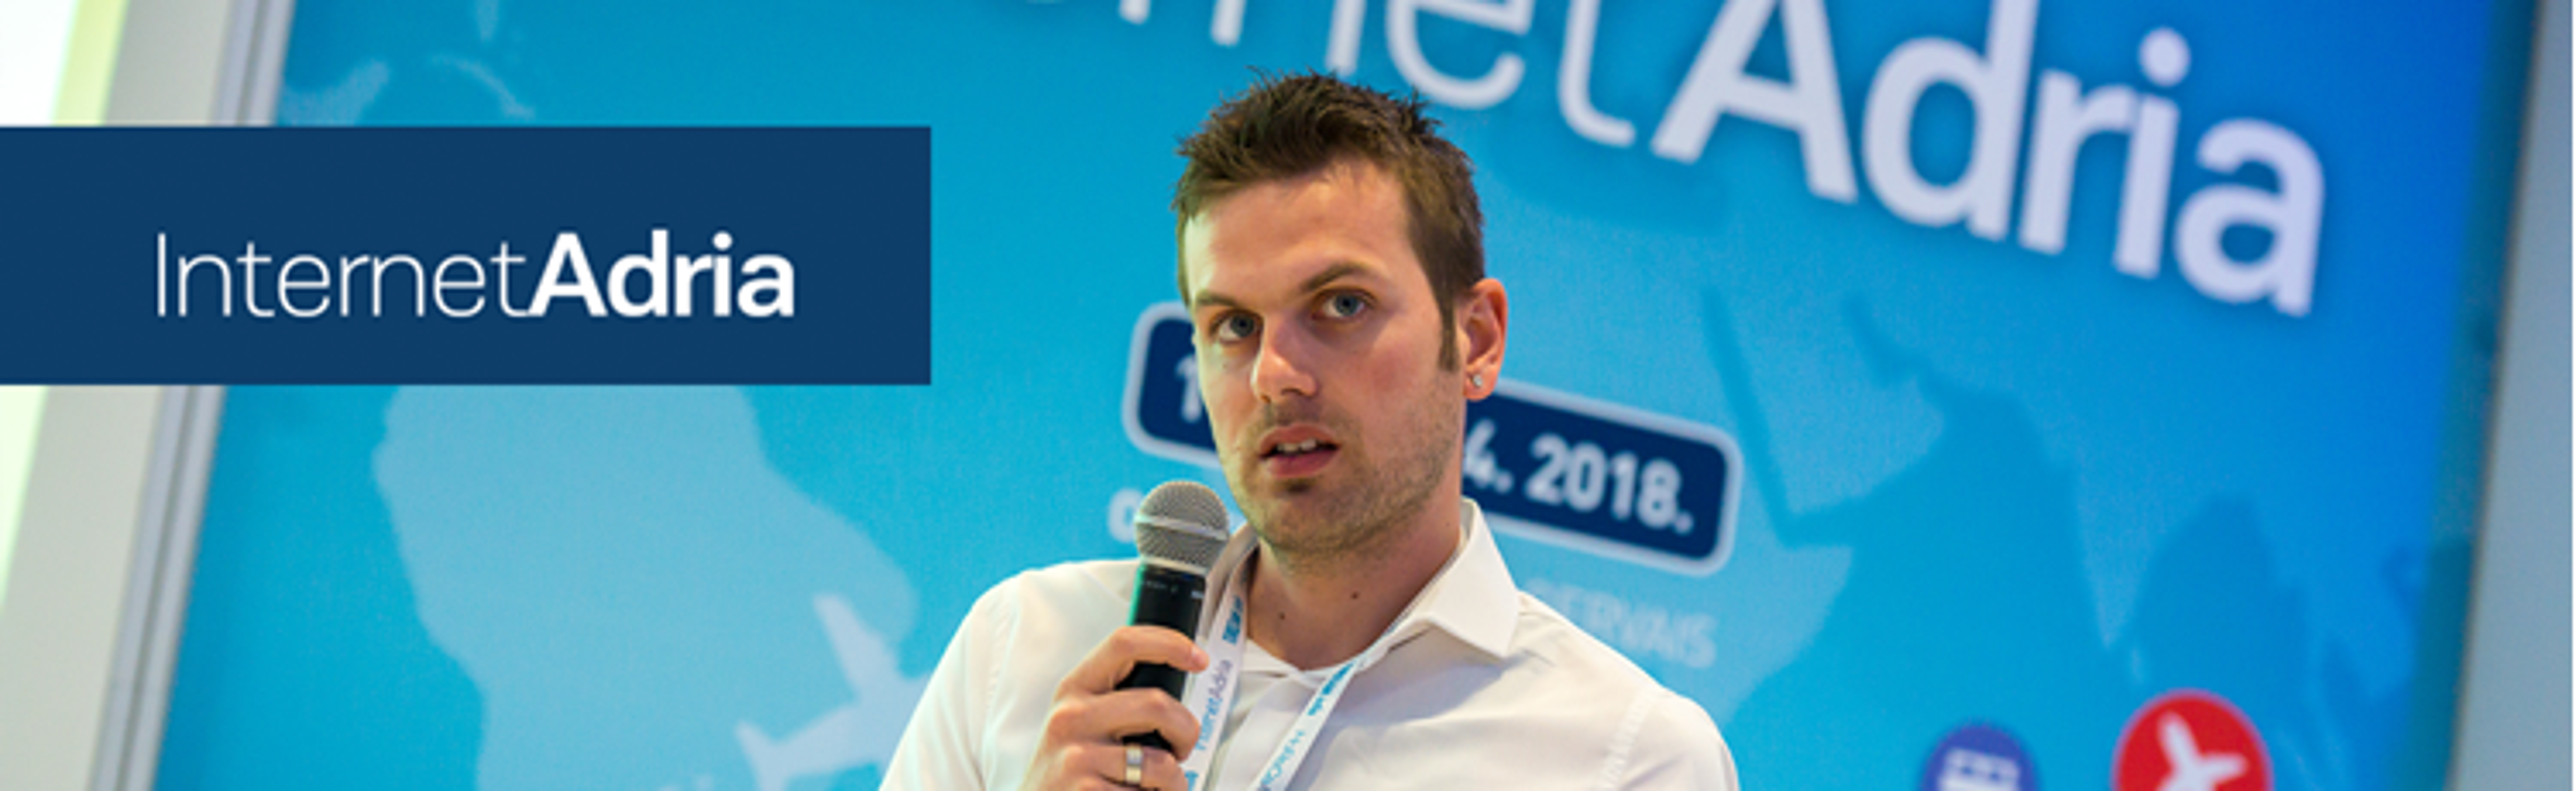 Naš Andrej Tonković na Internet Adria konferenciji: Kratki review